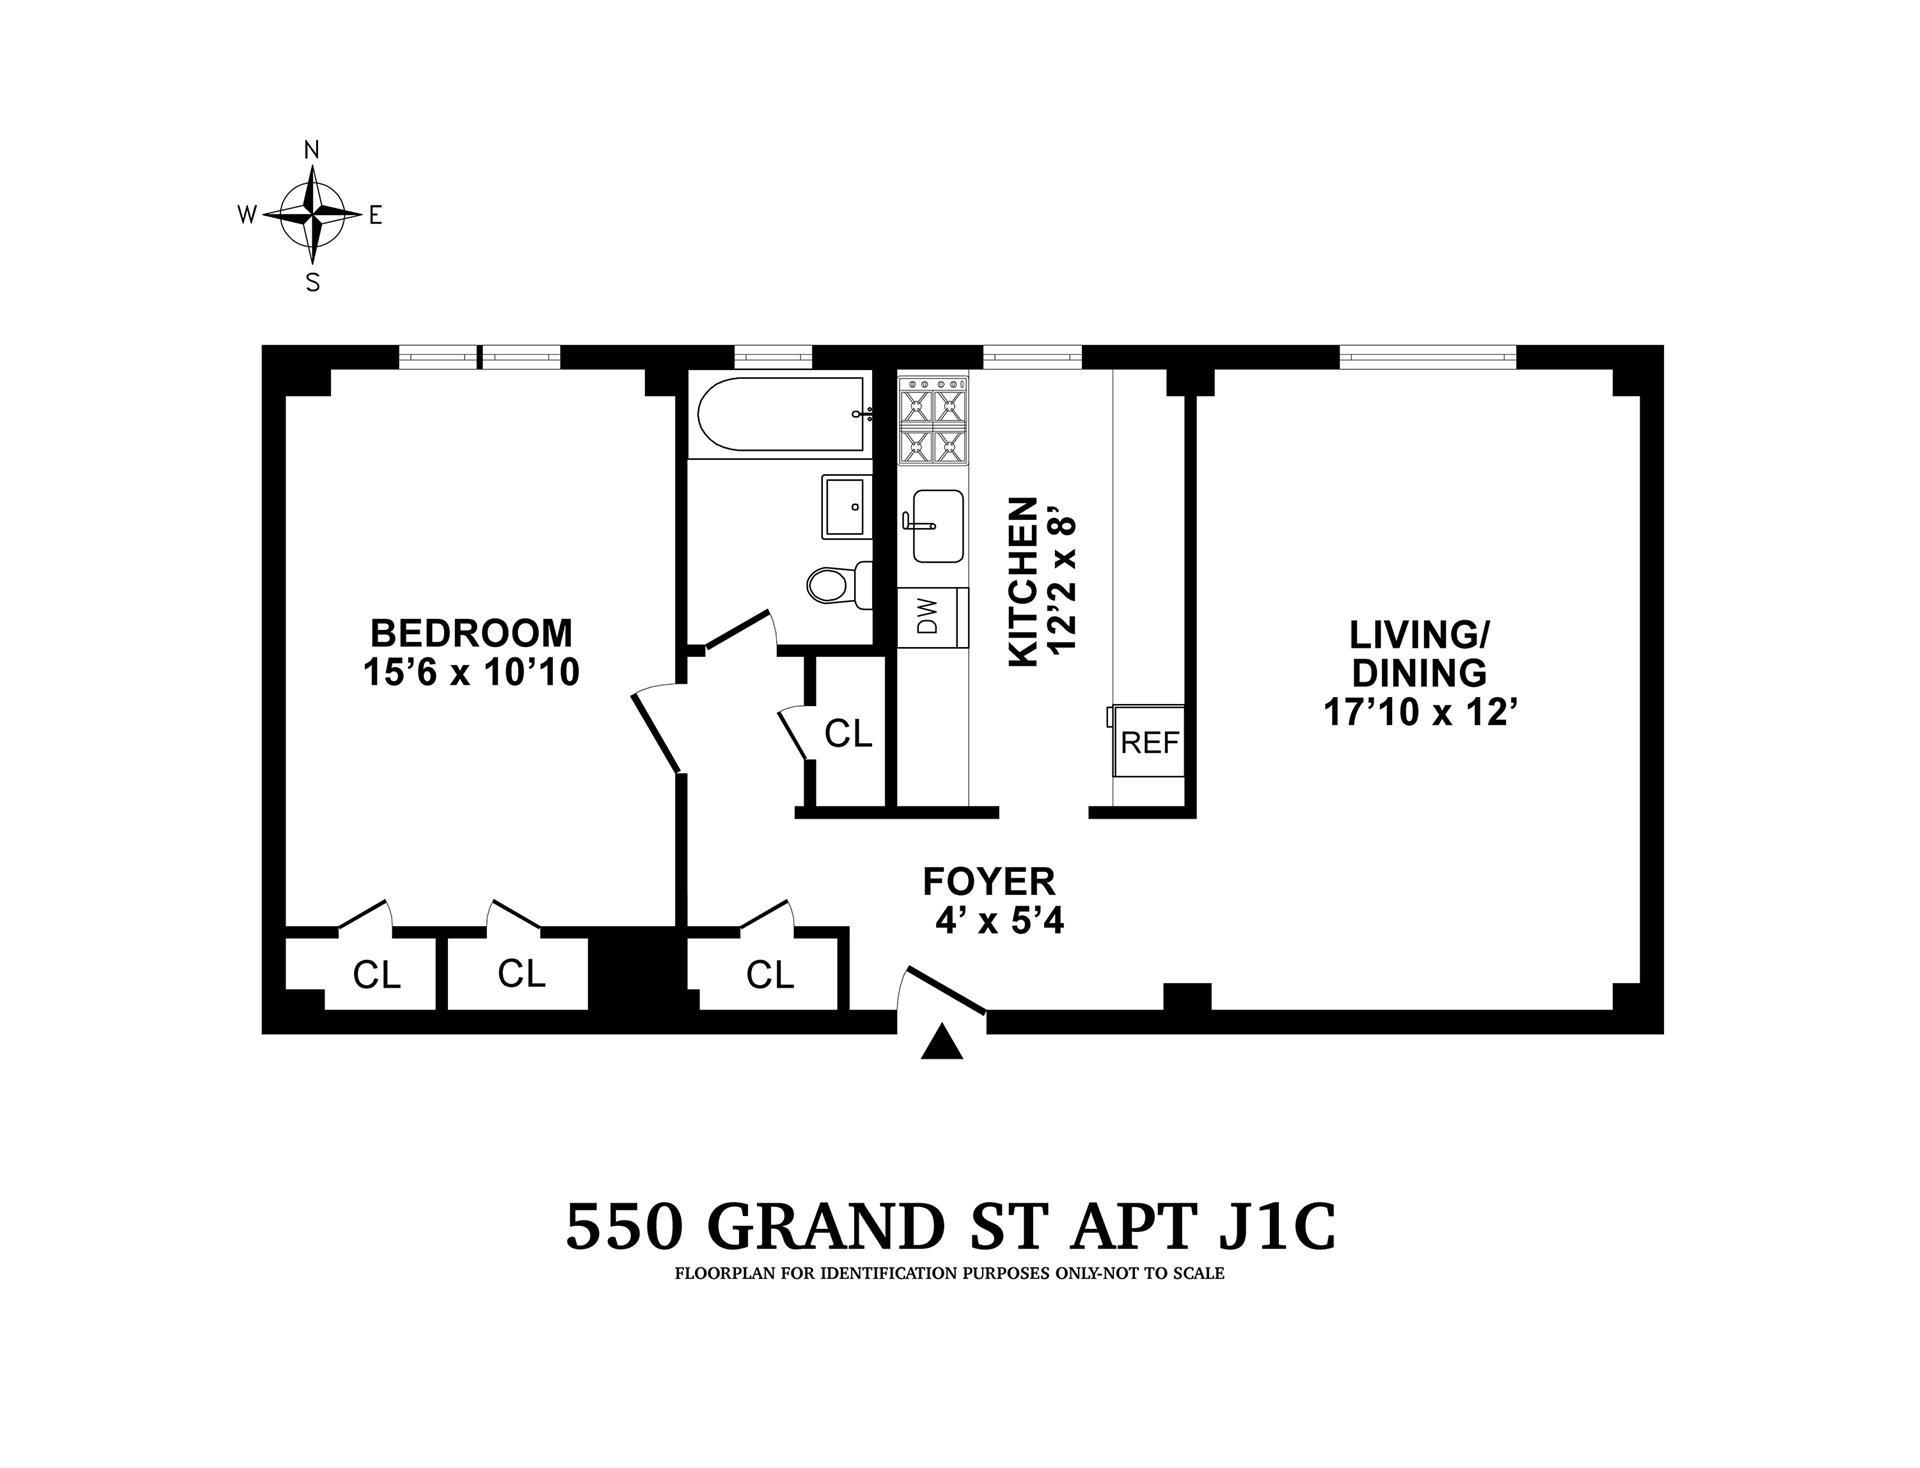 550 Grand Street